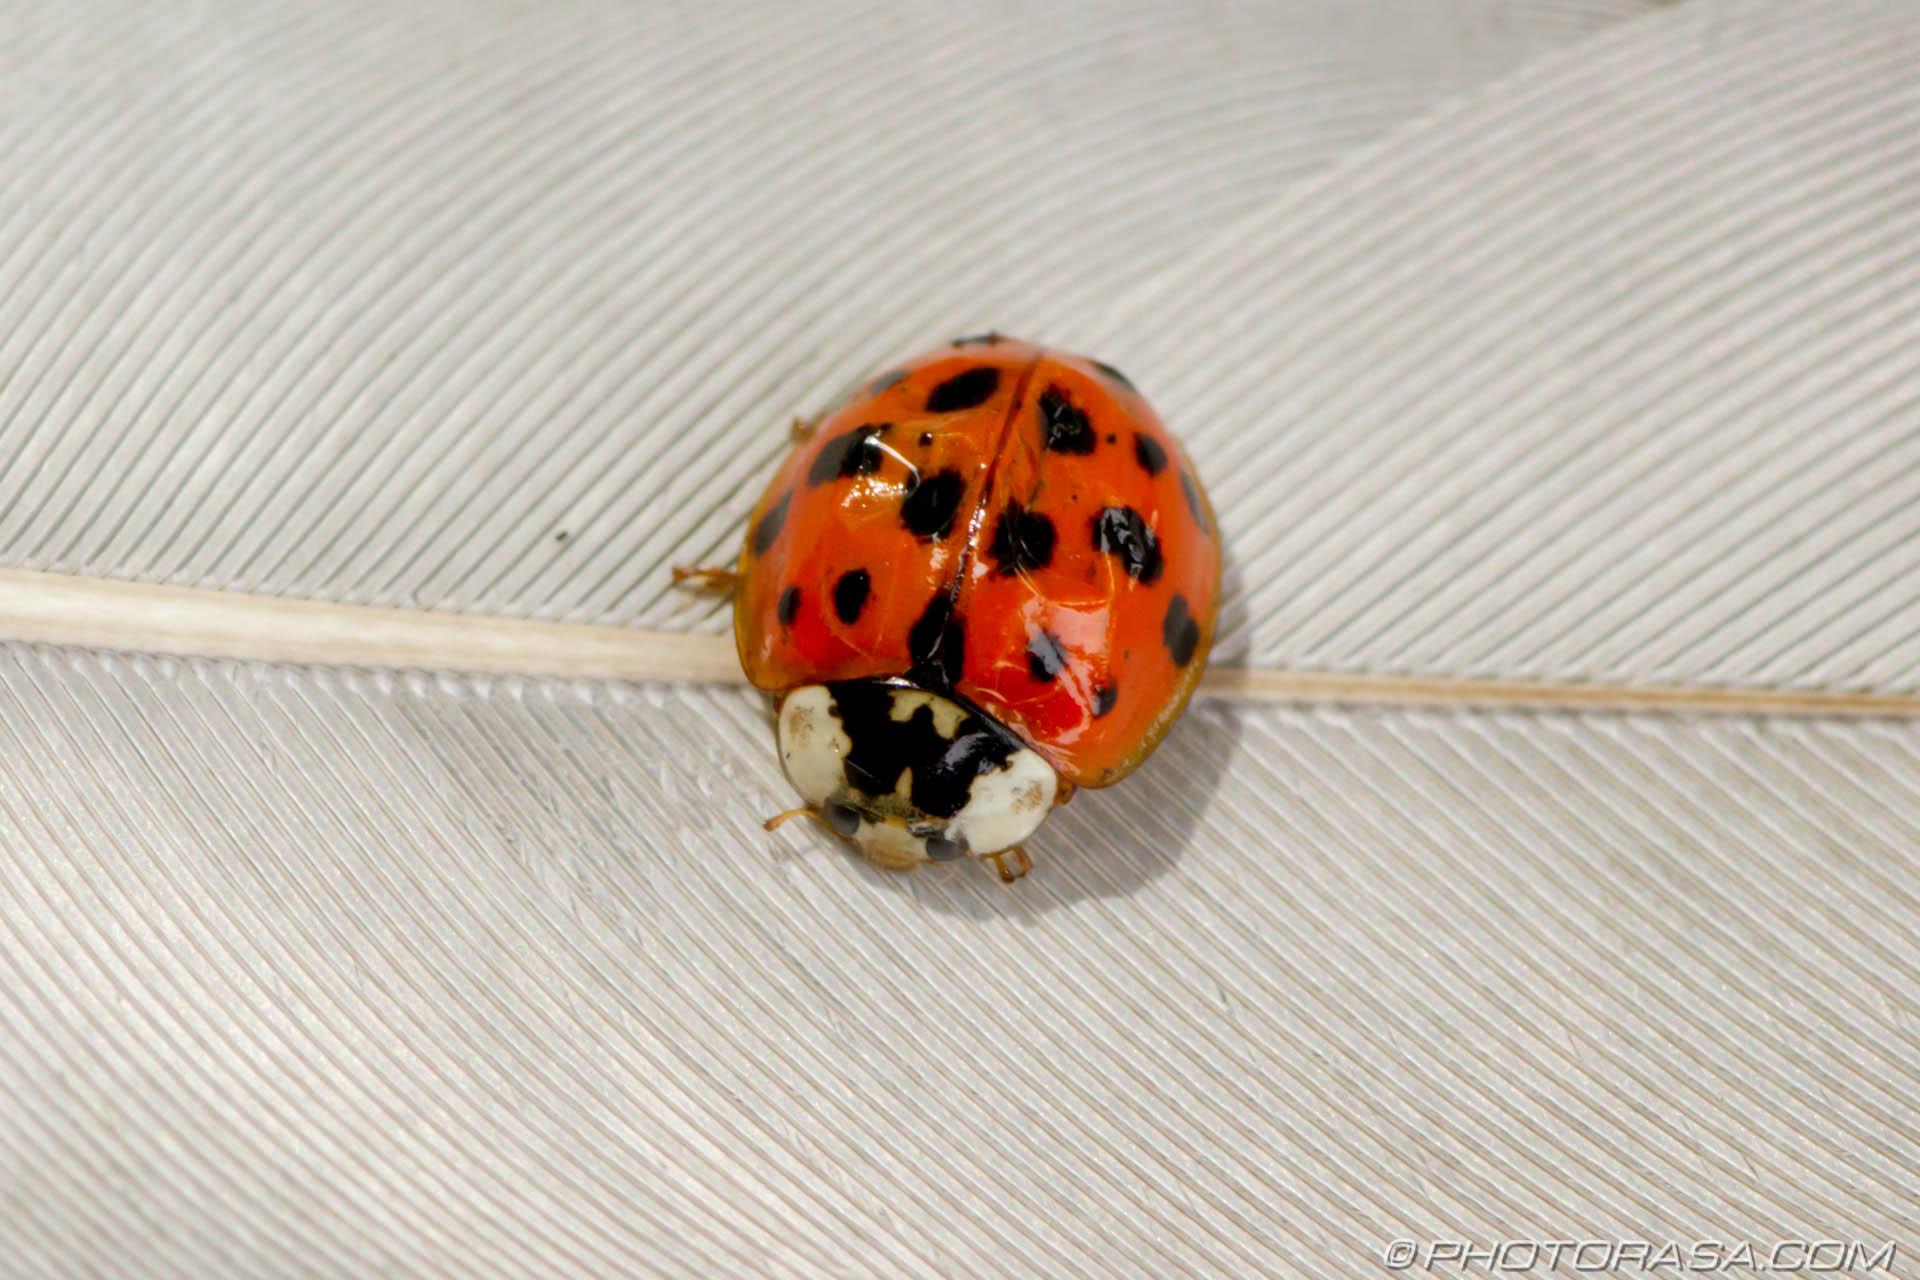 http://photorasa.com/beetles/close-up-of-ladybird-with-on-feather/